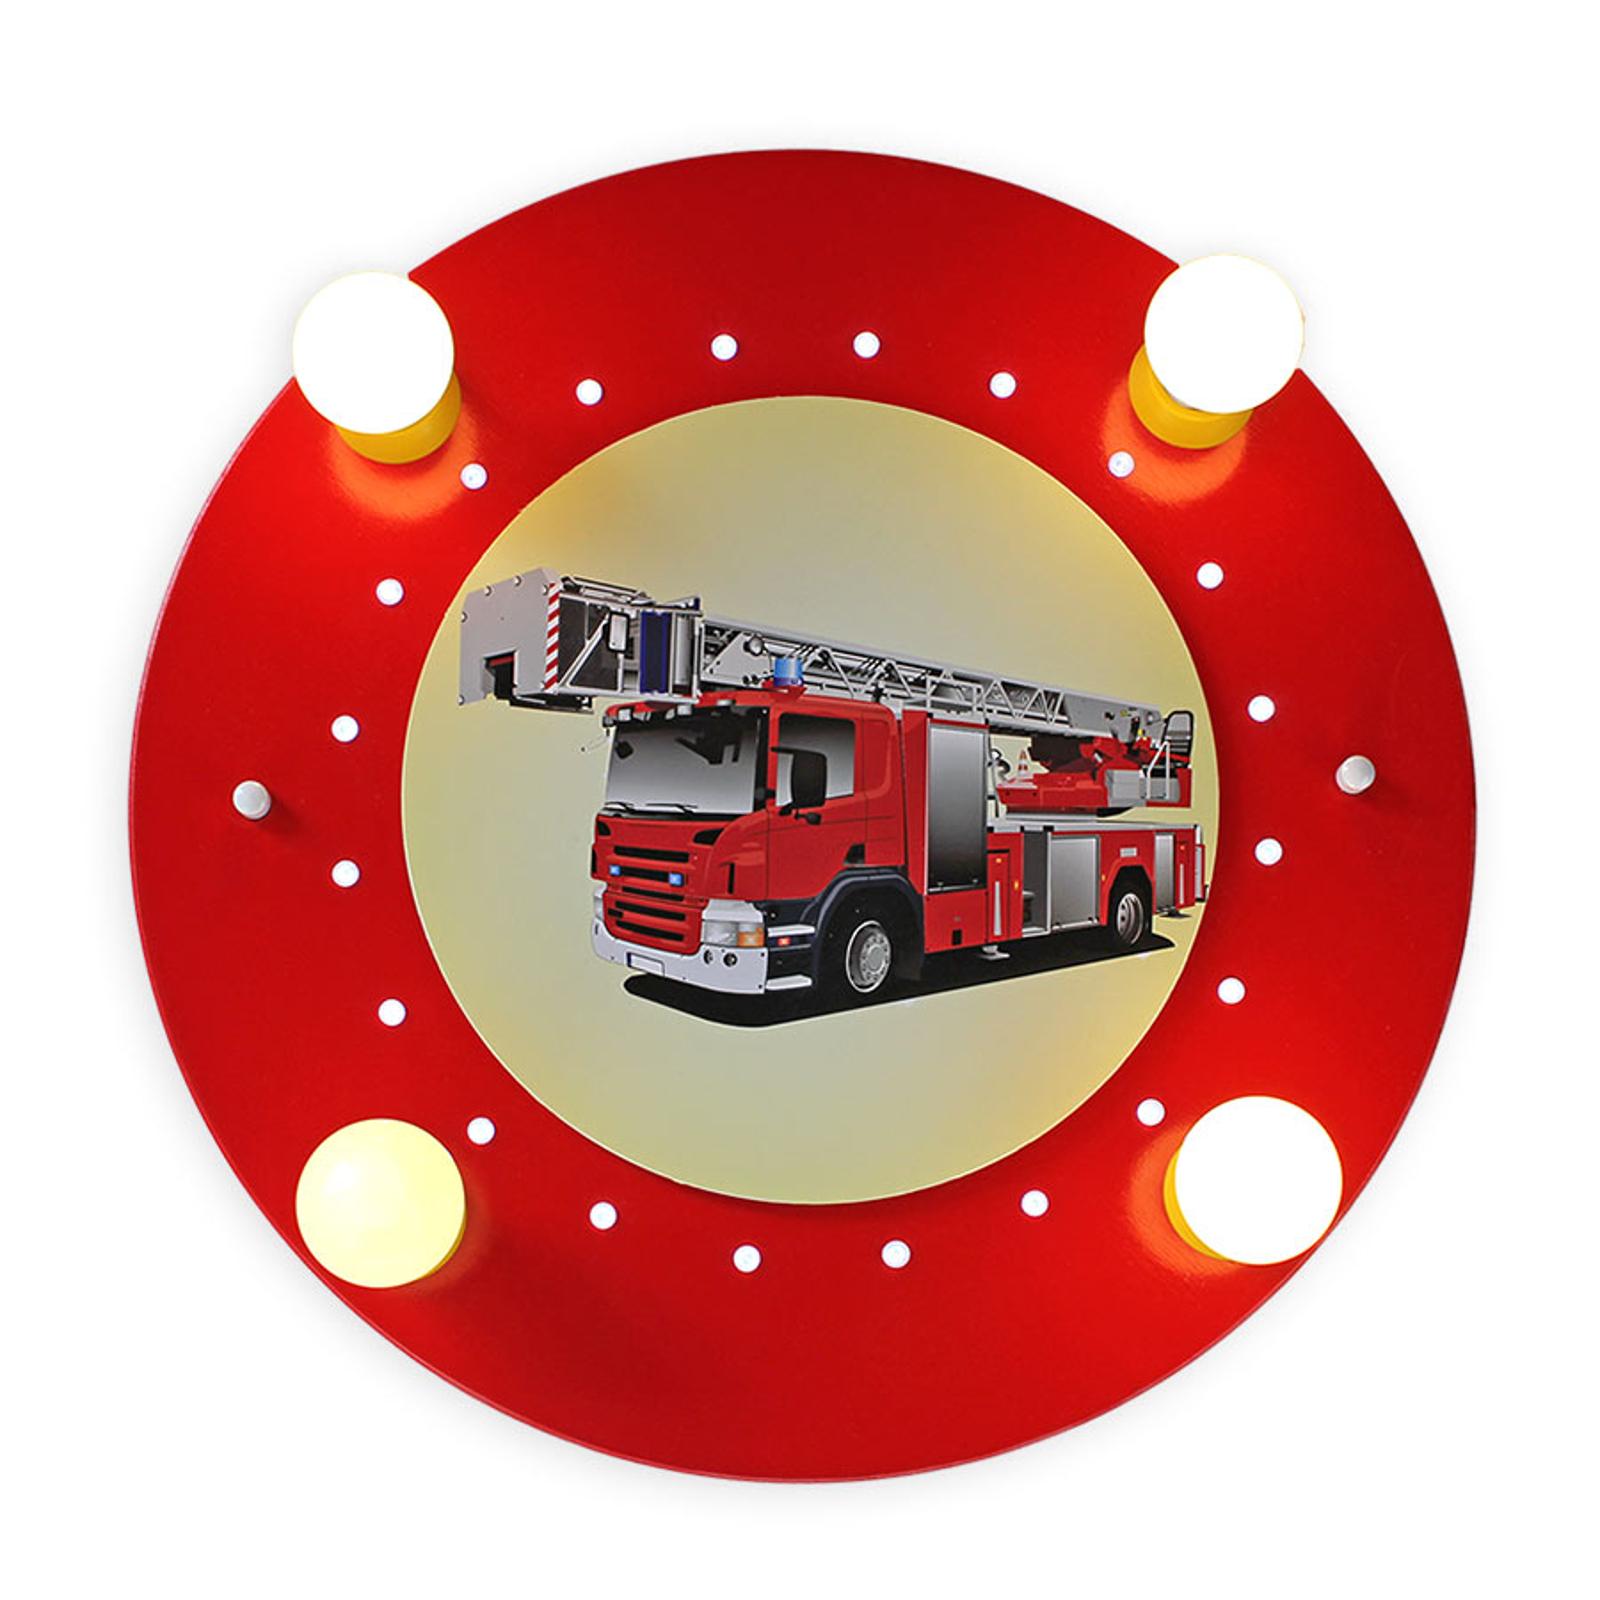 Lampa sufitowa Samochód strażacki, 4-punktowa